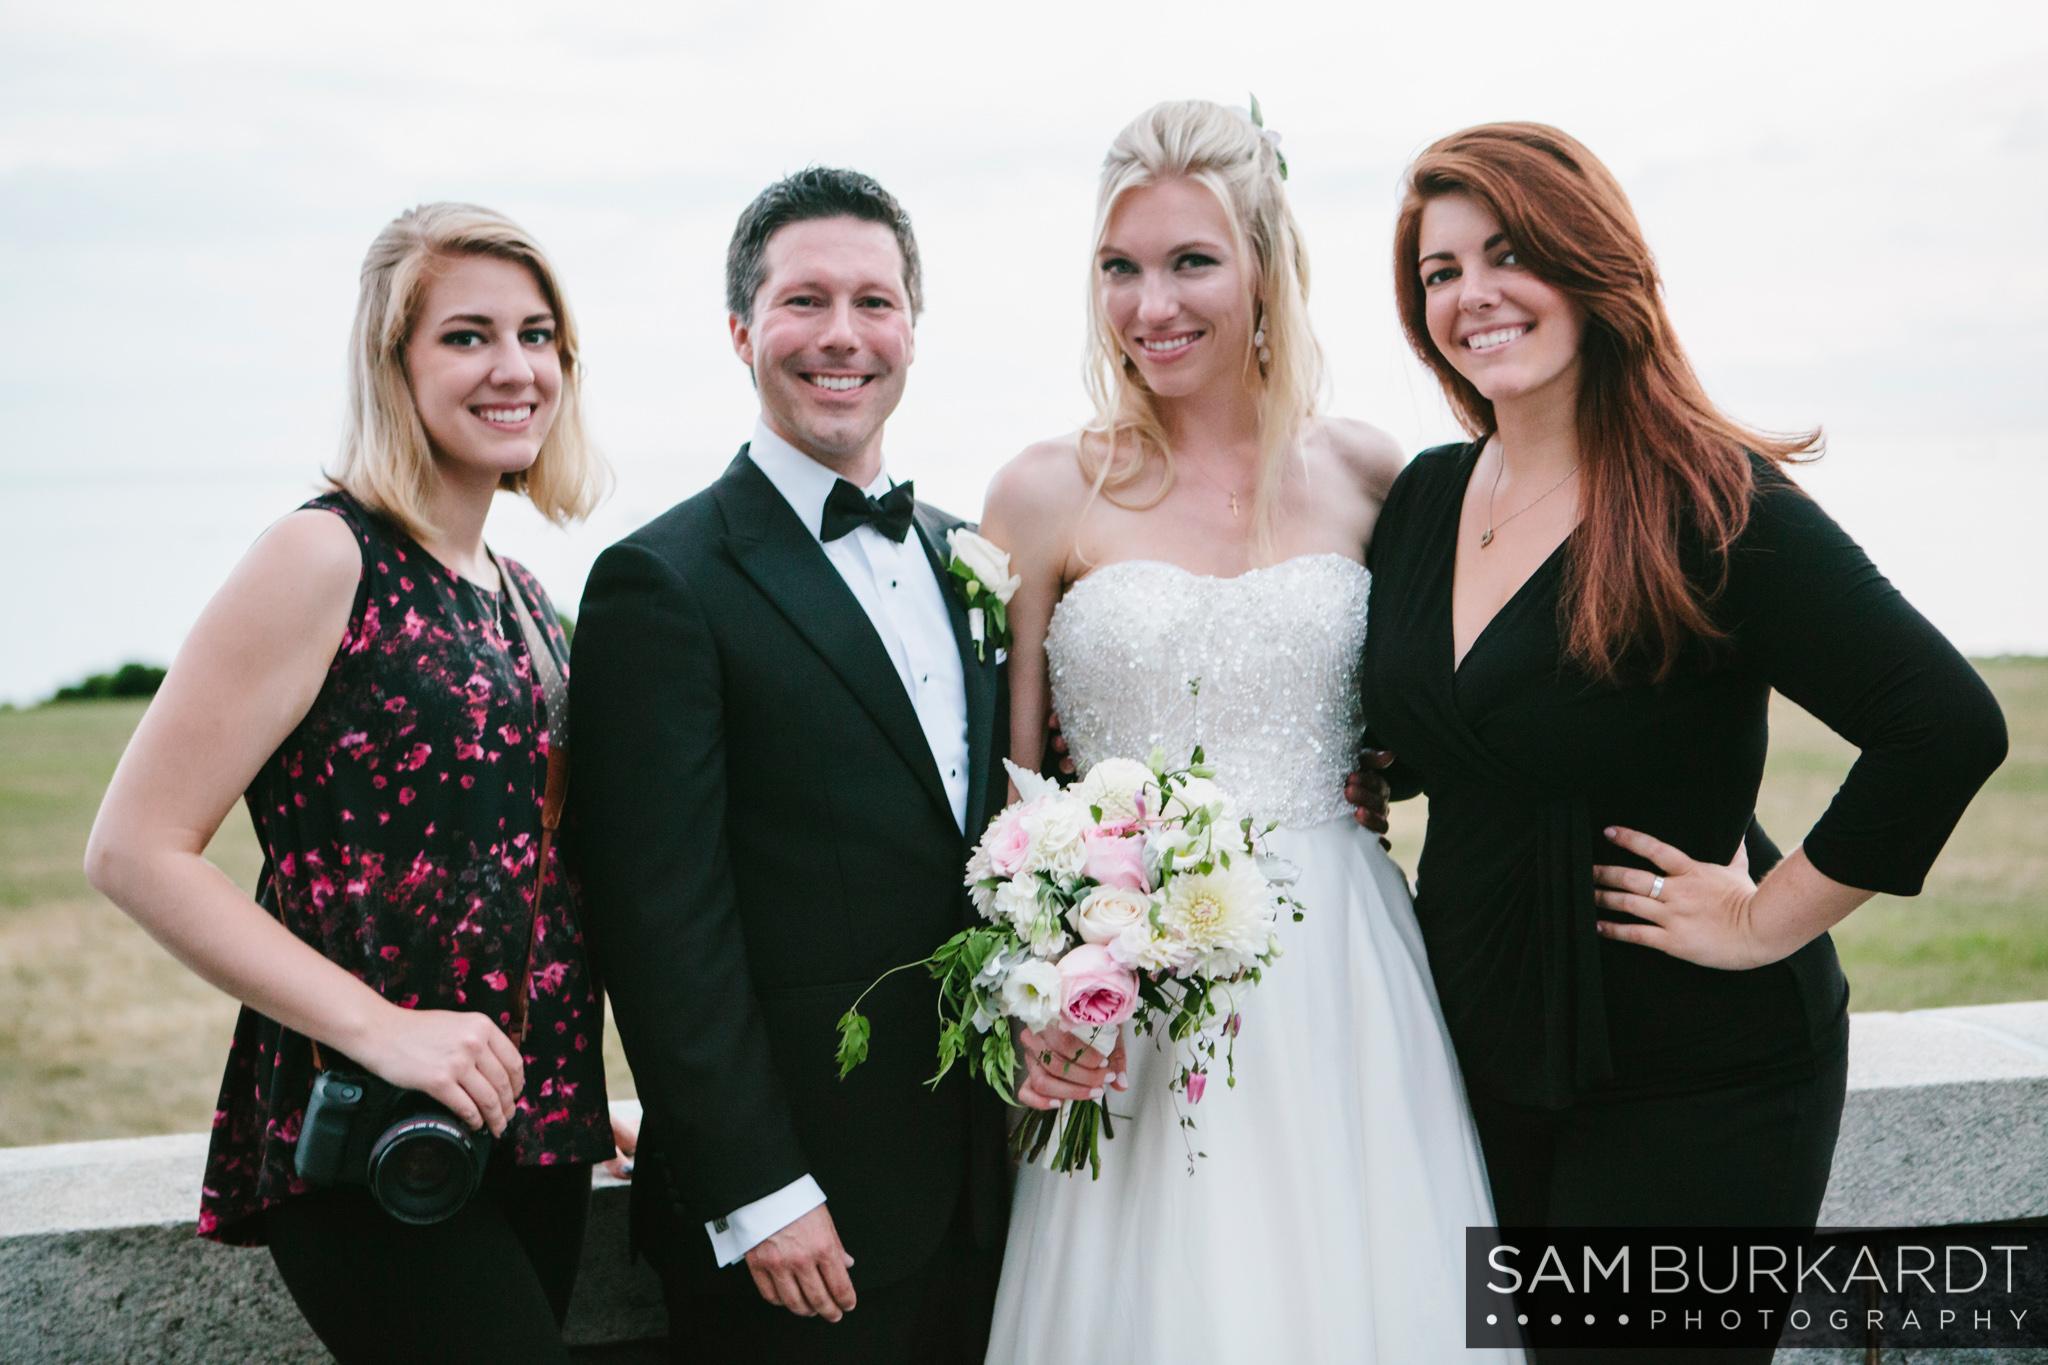 samburkardt_platz_moore_connecticut_branford_house_long_island_sound_august_photography_wedding_glamour_pink_0044.jpg